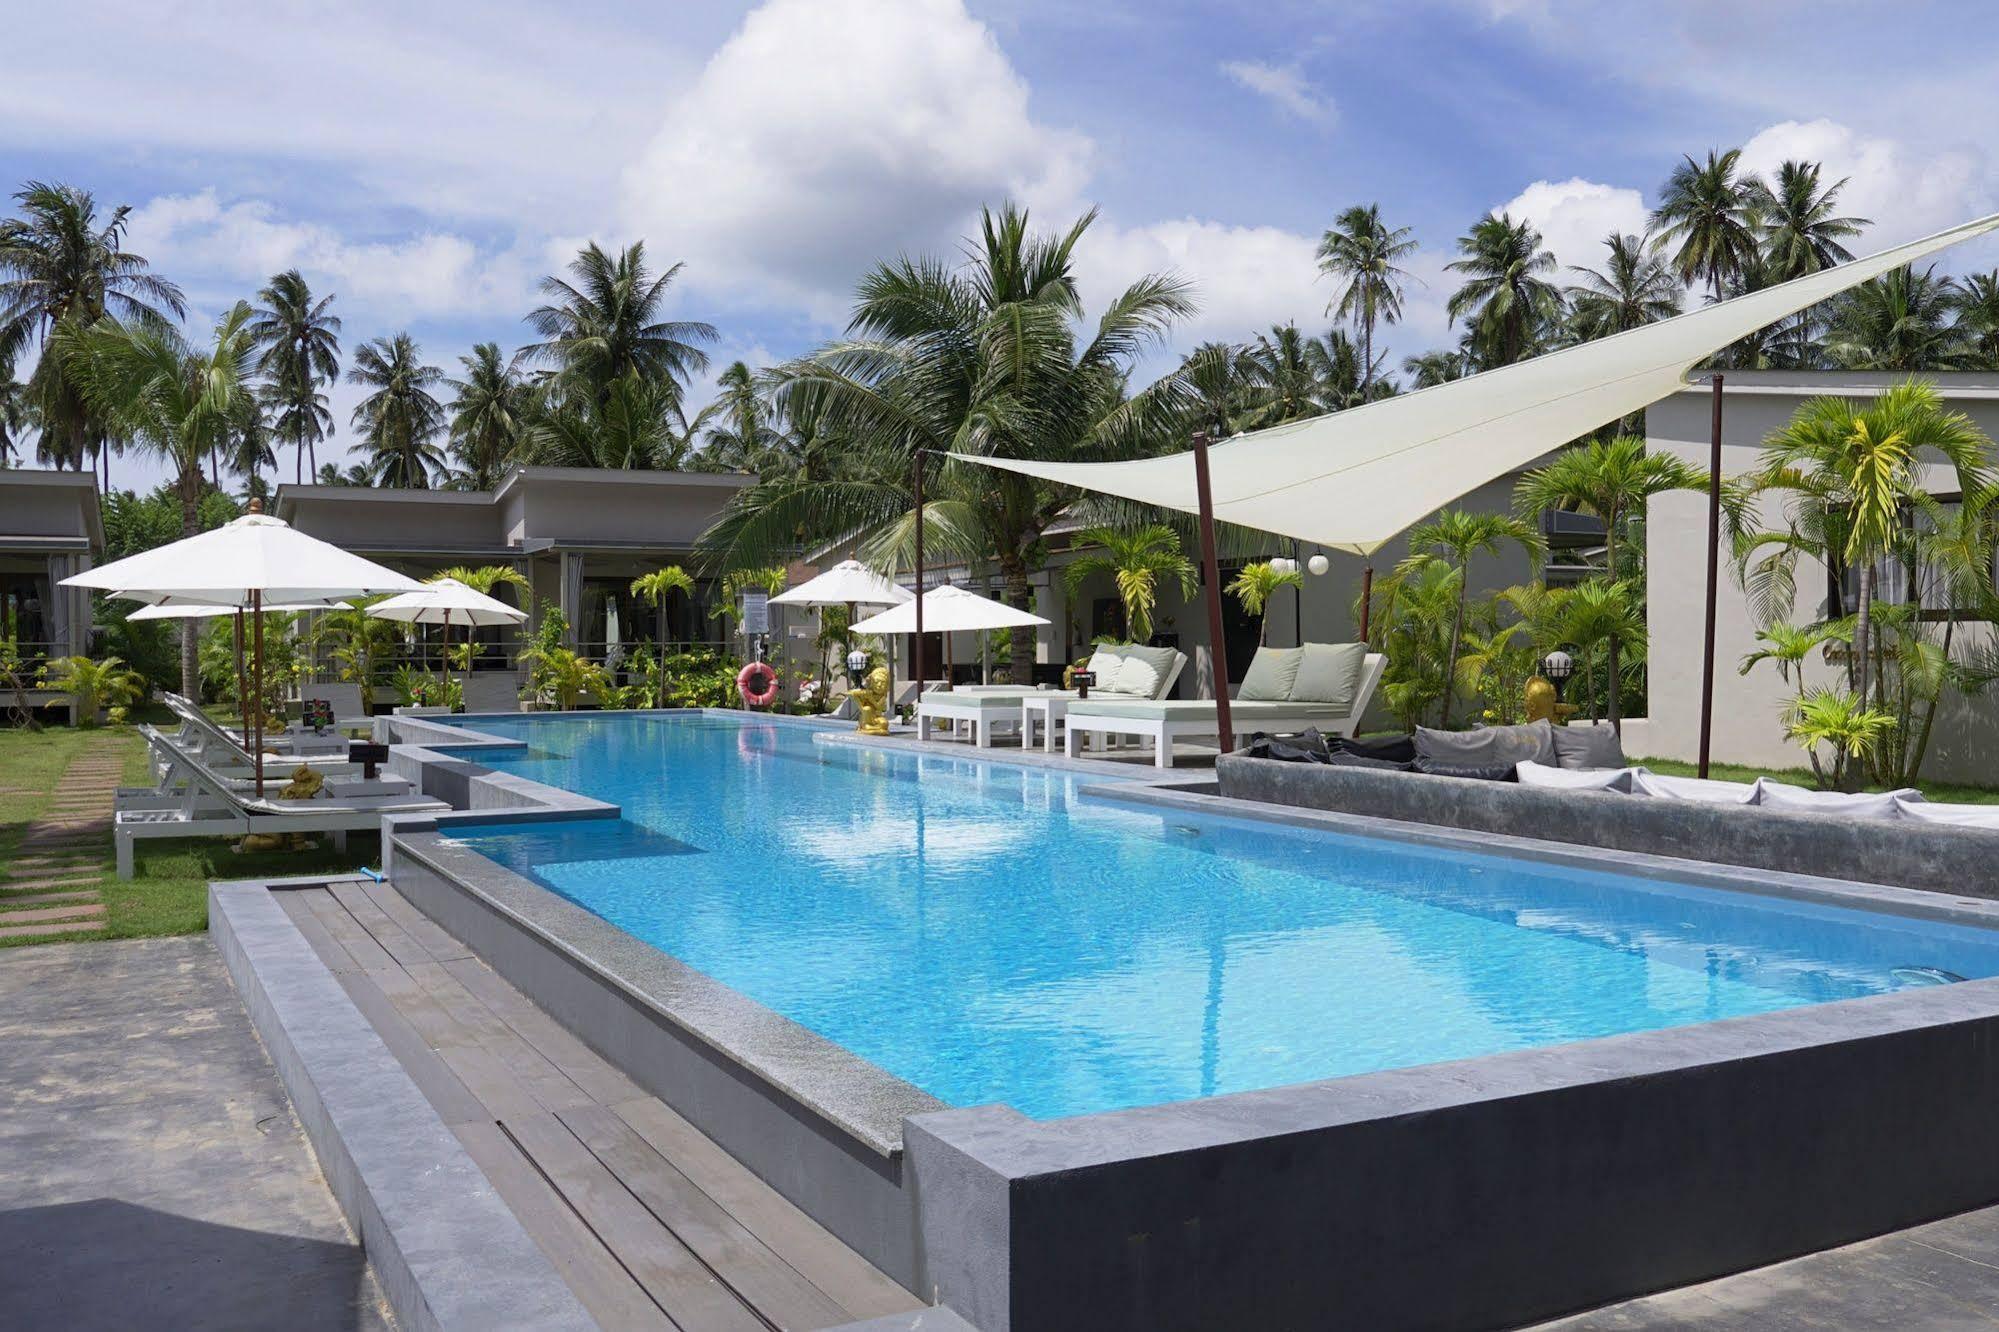 CoconutsPalm Resort